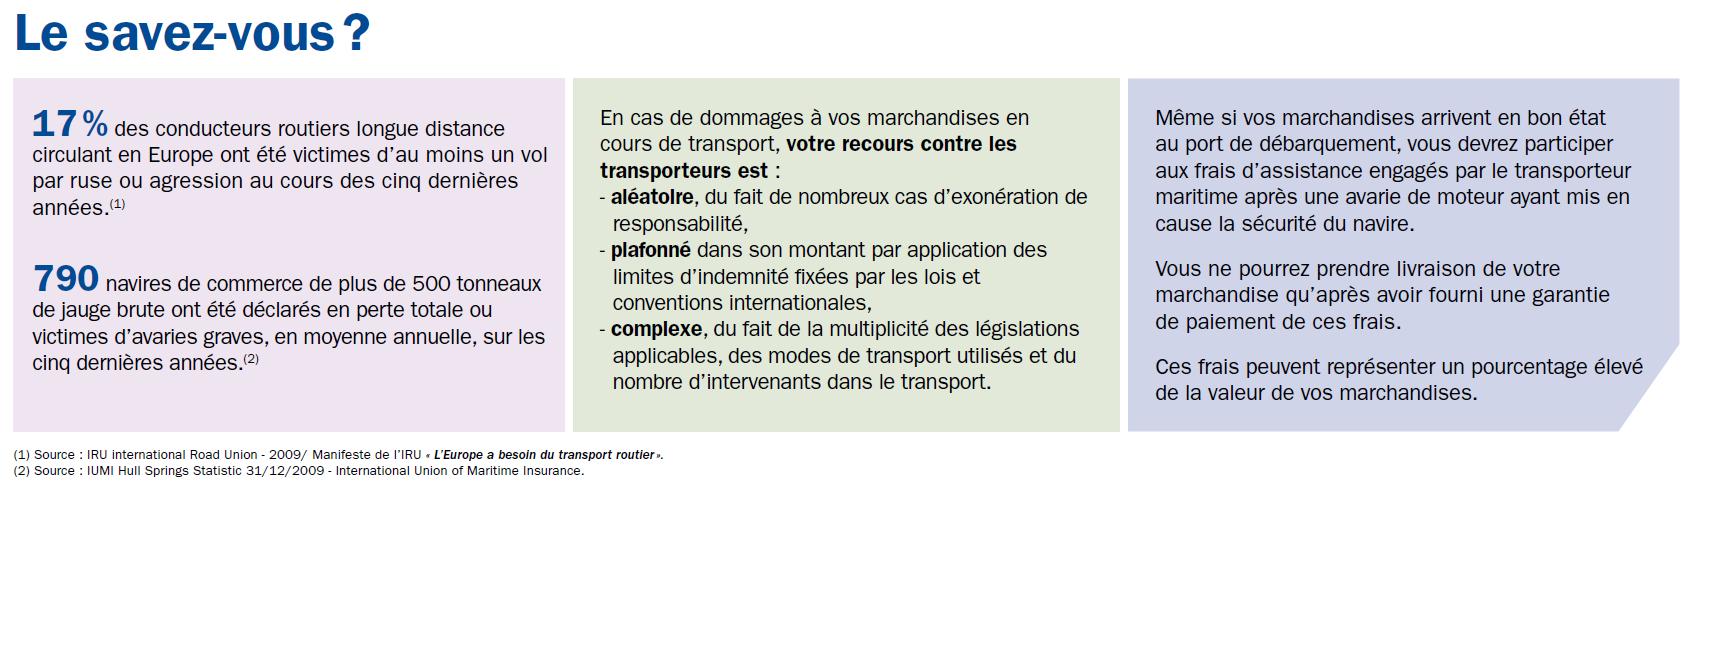 marchandise-transportee-assurance